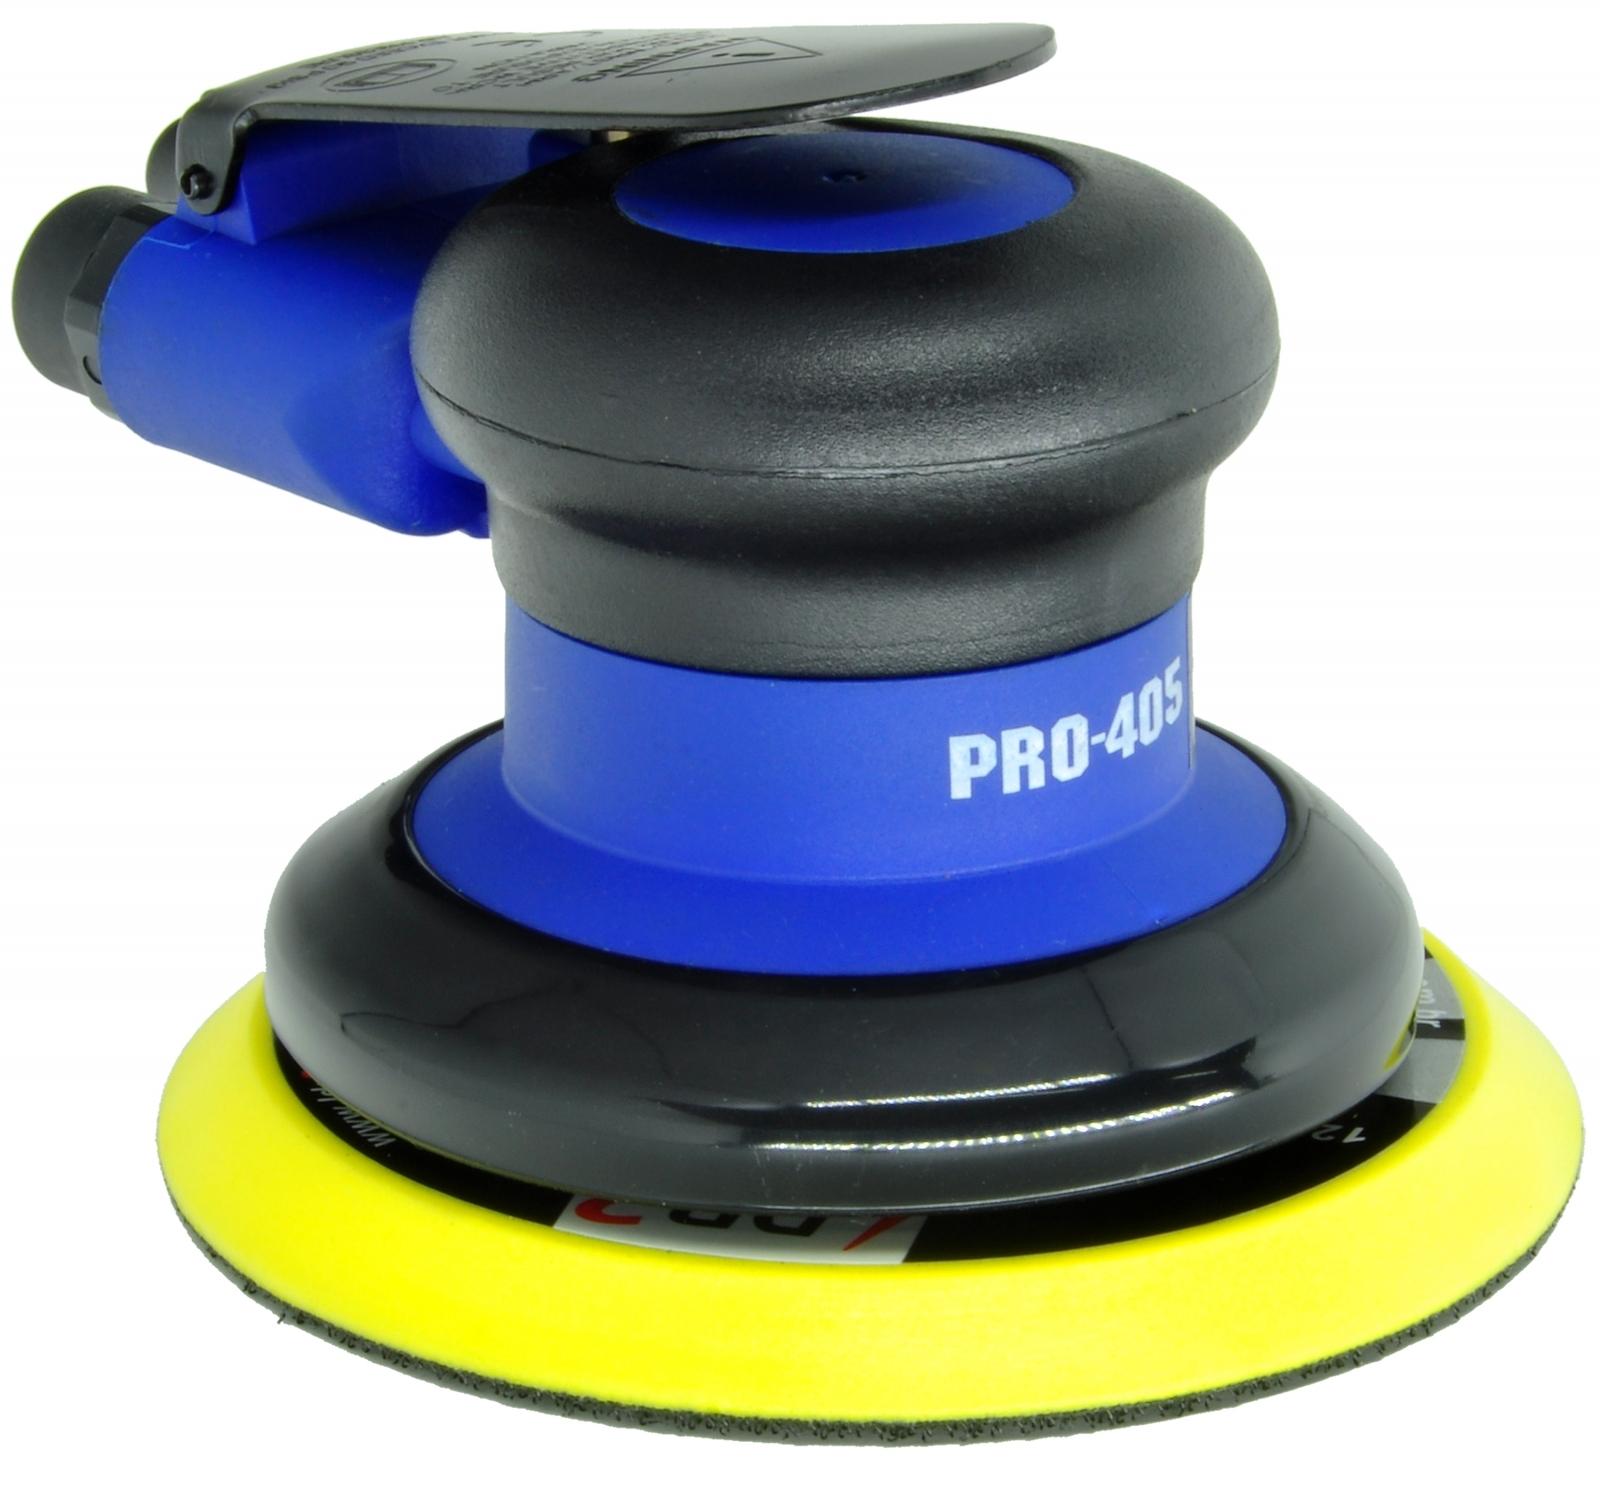 Lixadeira Pneumática Roto Orbital Hookit PDR Pro-405 Base 5